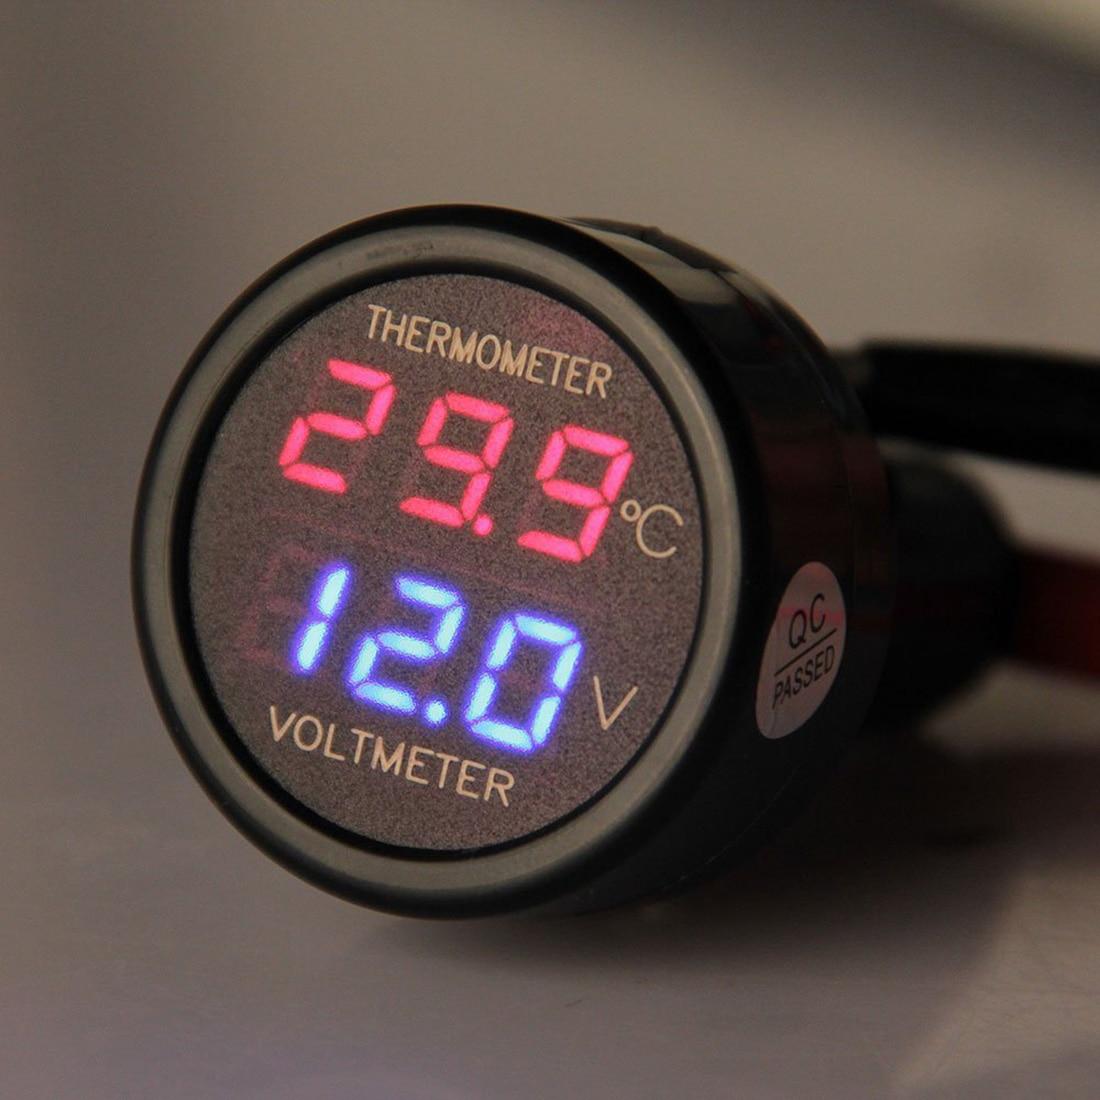 2 In 1 Red Digital LED Car Voltmeter Thermometer Auto Car USB Charger 12V/24V Temperature Meter Voltmeter 1Pc